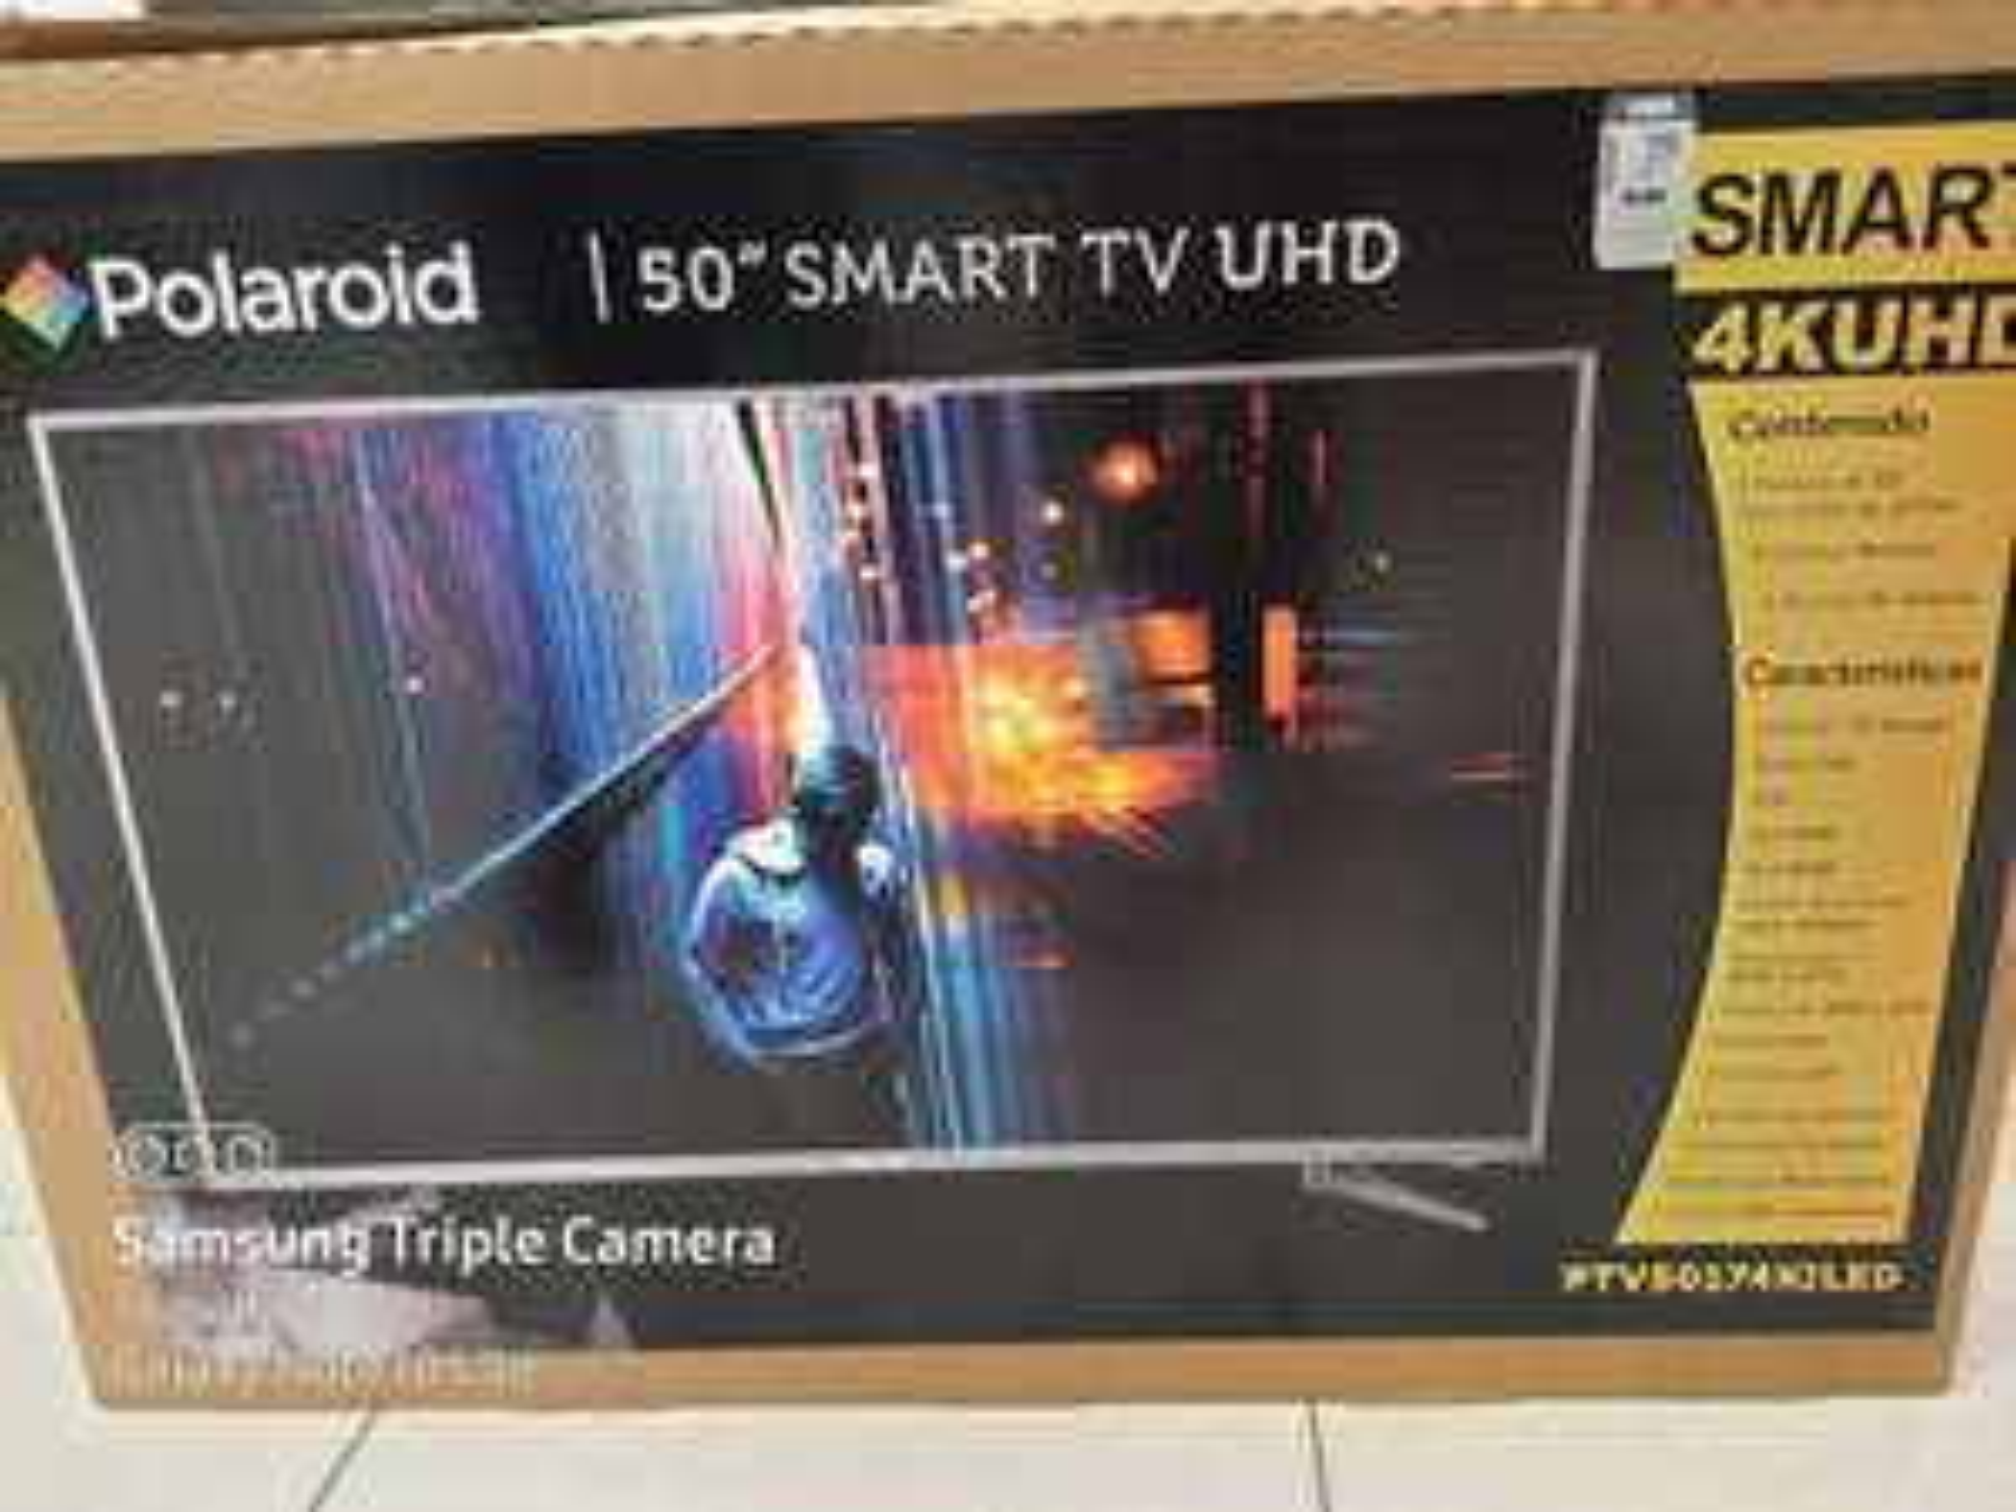 "Suburbia: Pantalla Polaroid 4K UHD 50"" Smart TV Android 7.1"